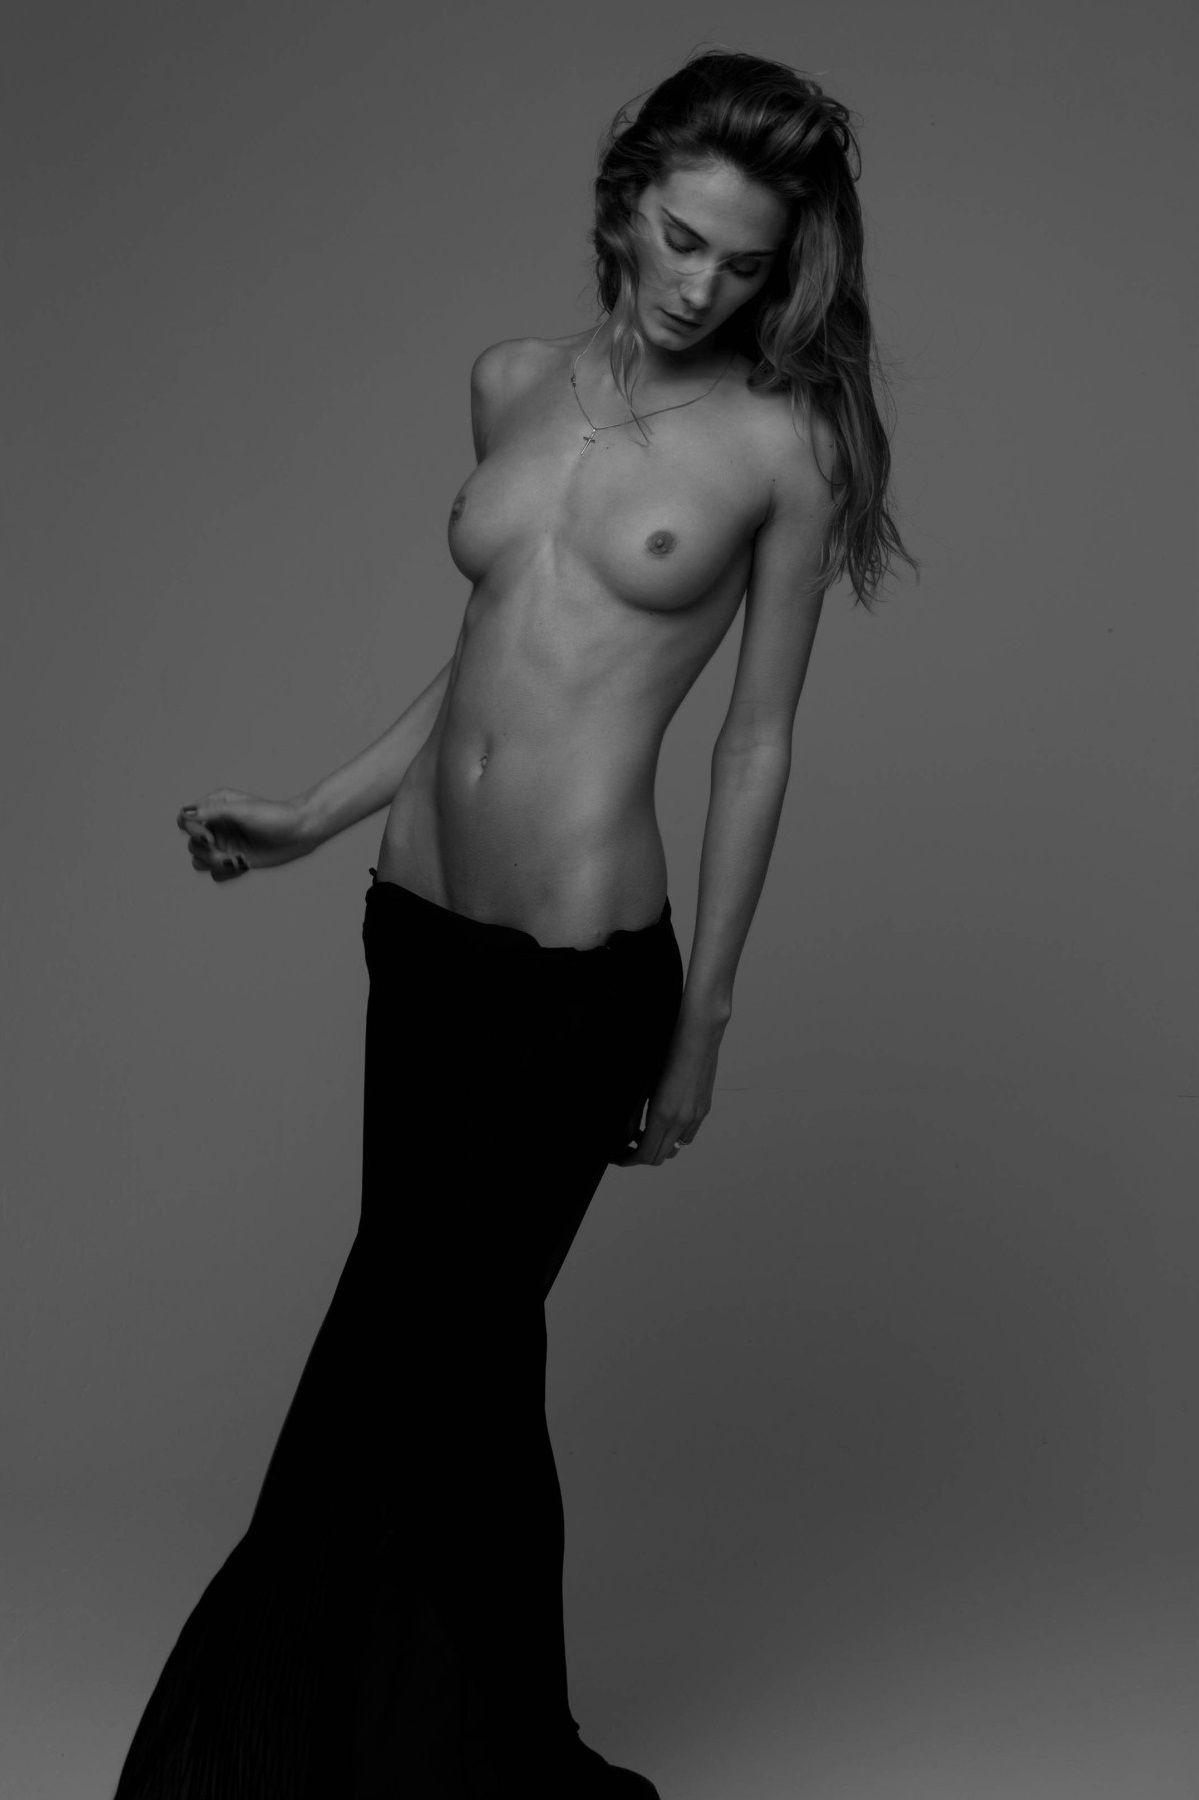 Nude girls in Estet MF pictures 11